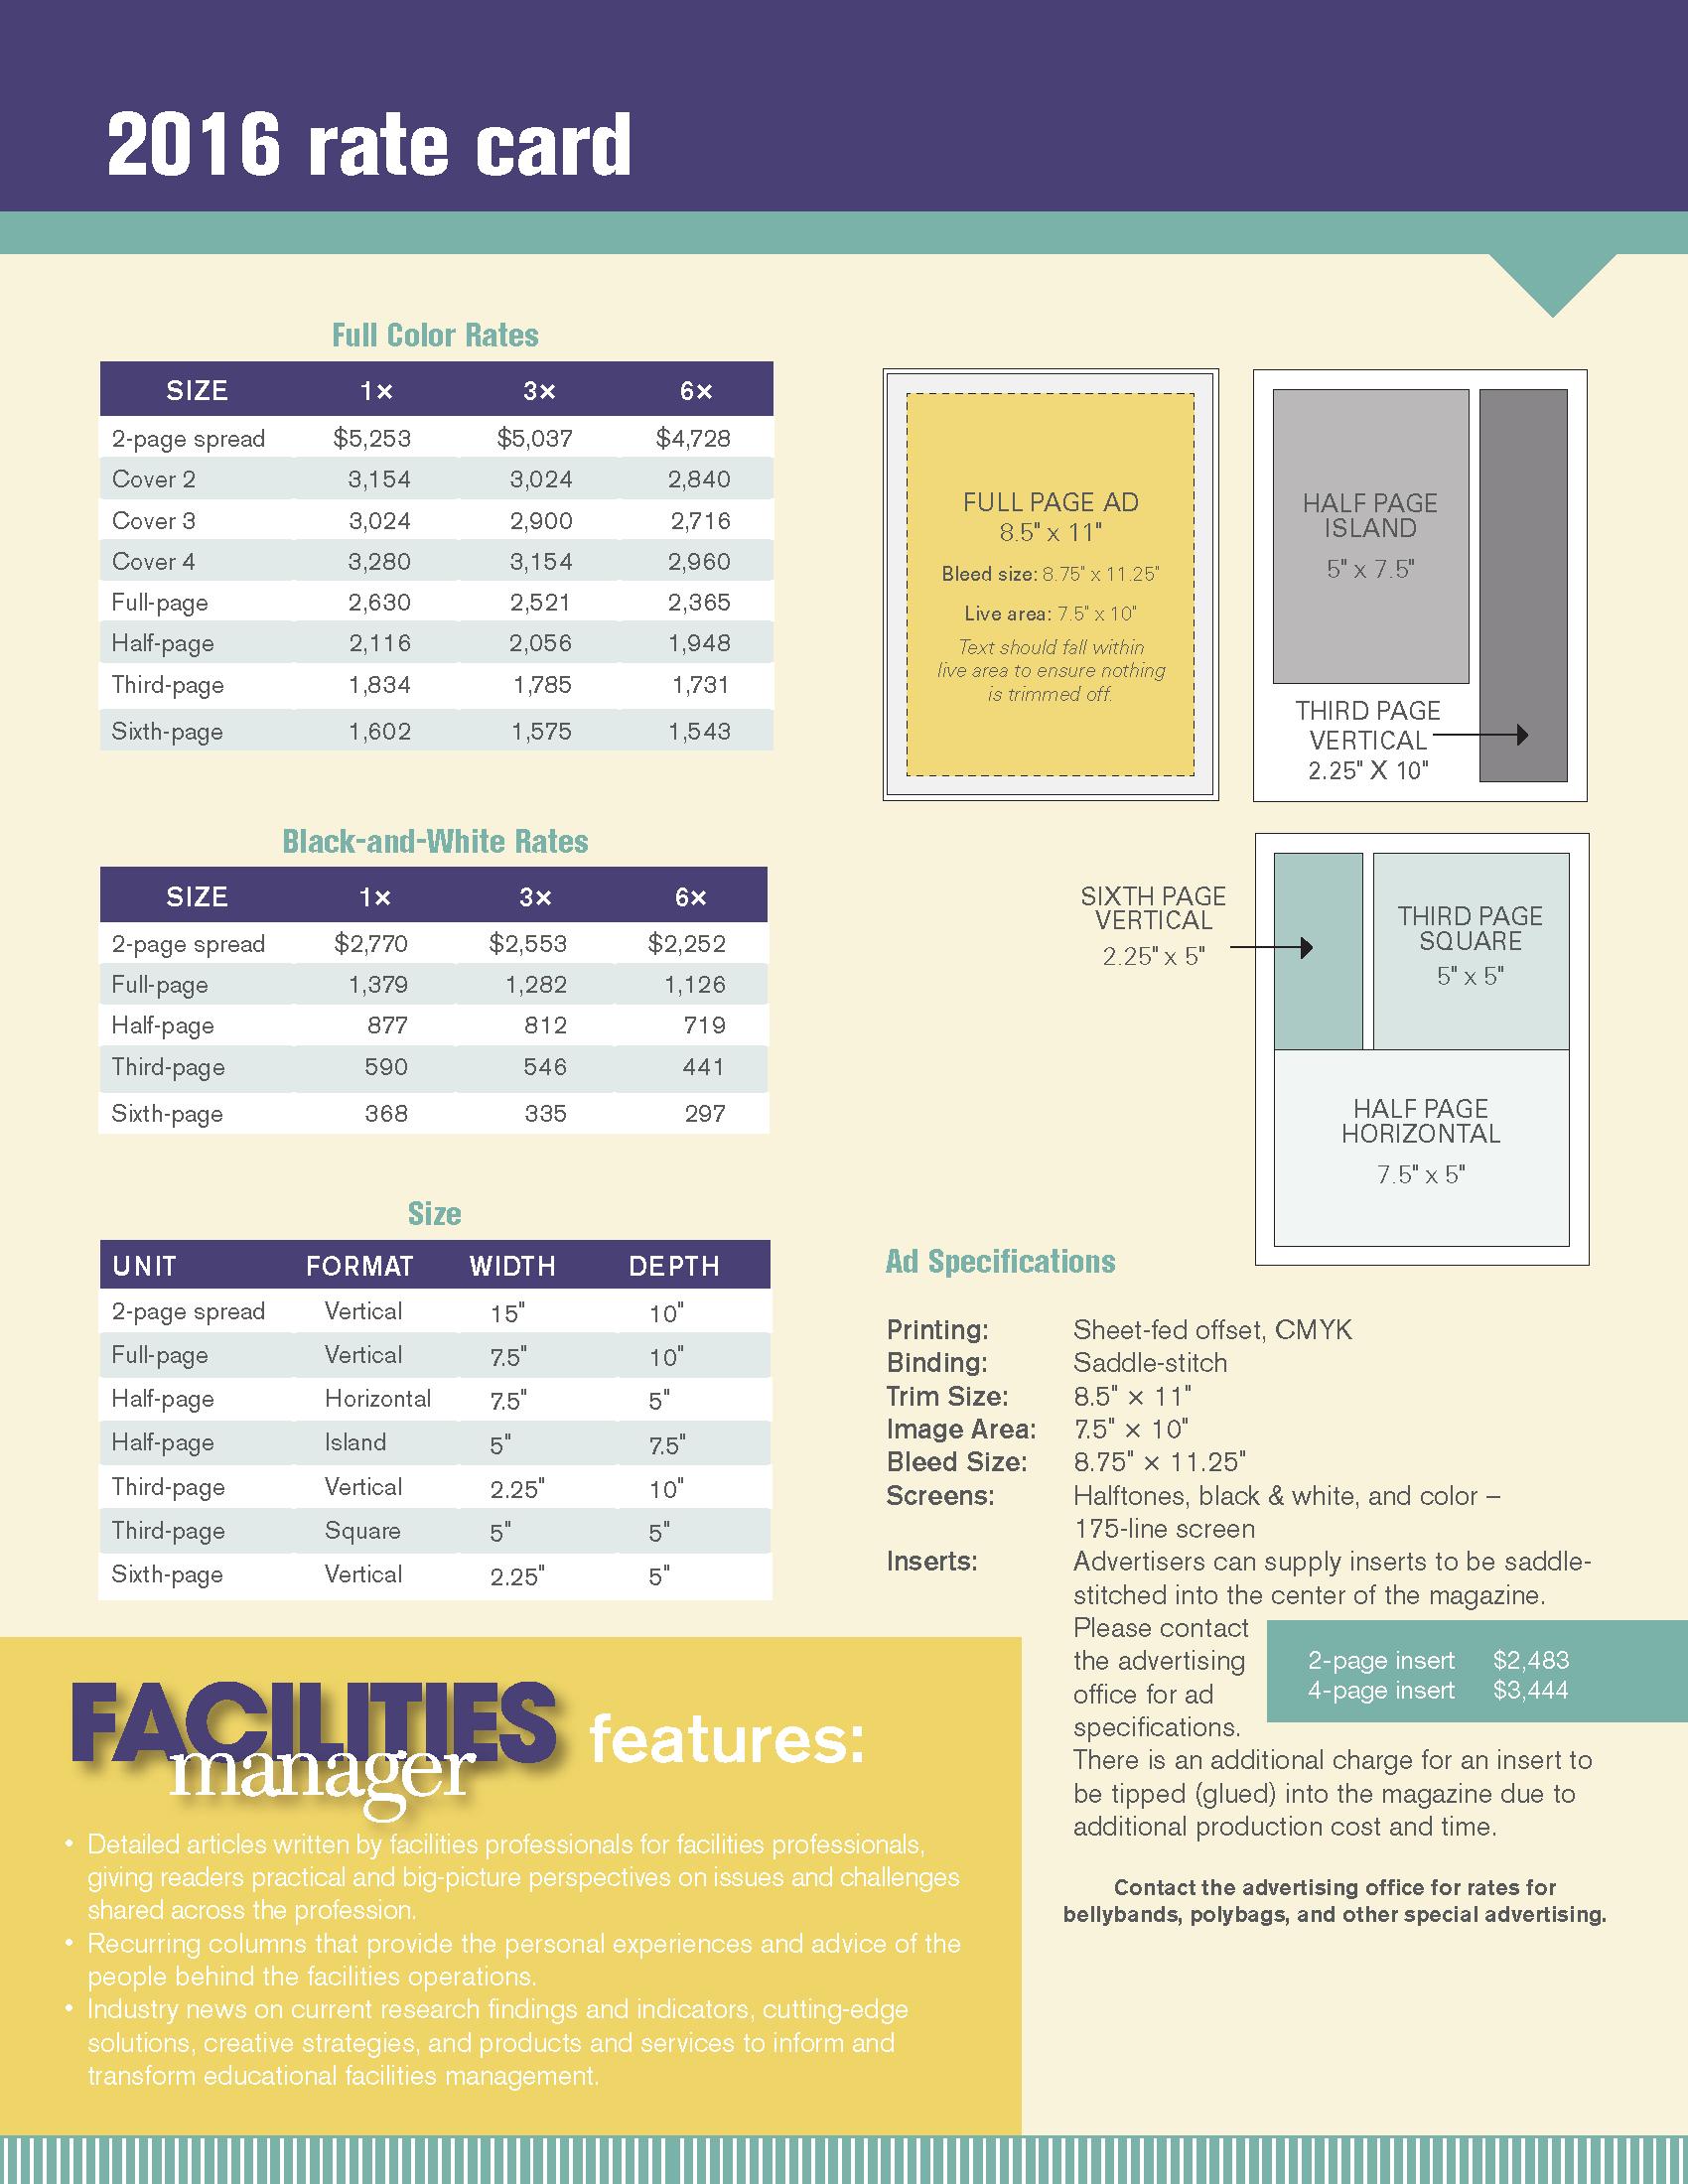 2016 FM media kit WEB_Page_4.png